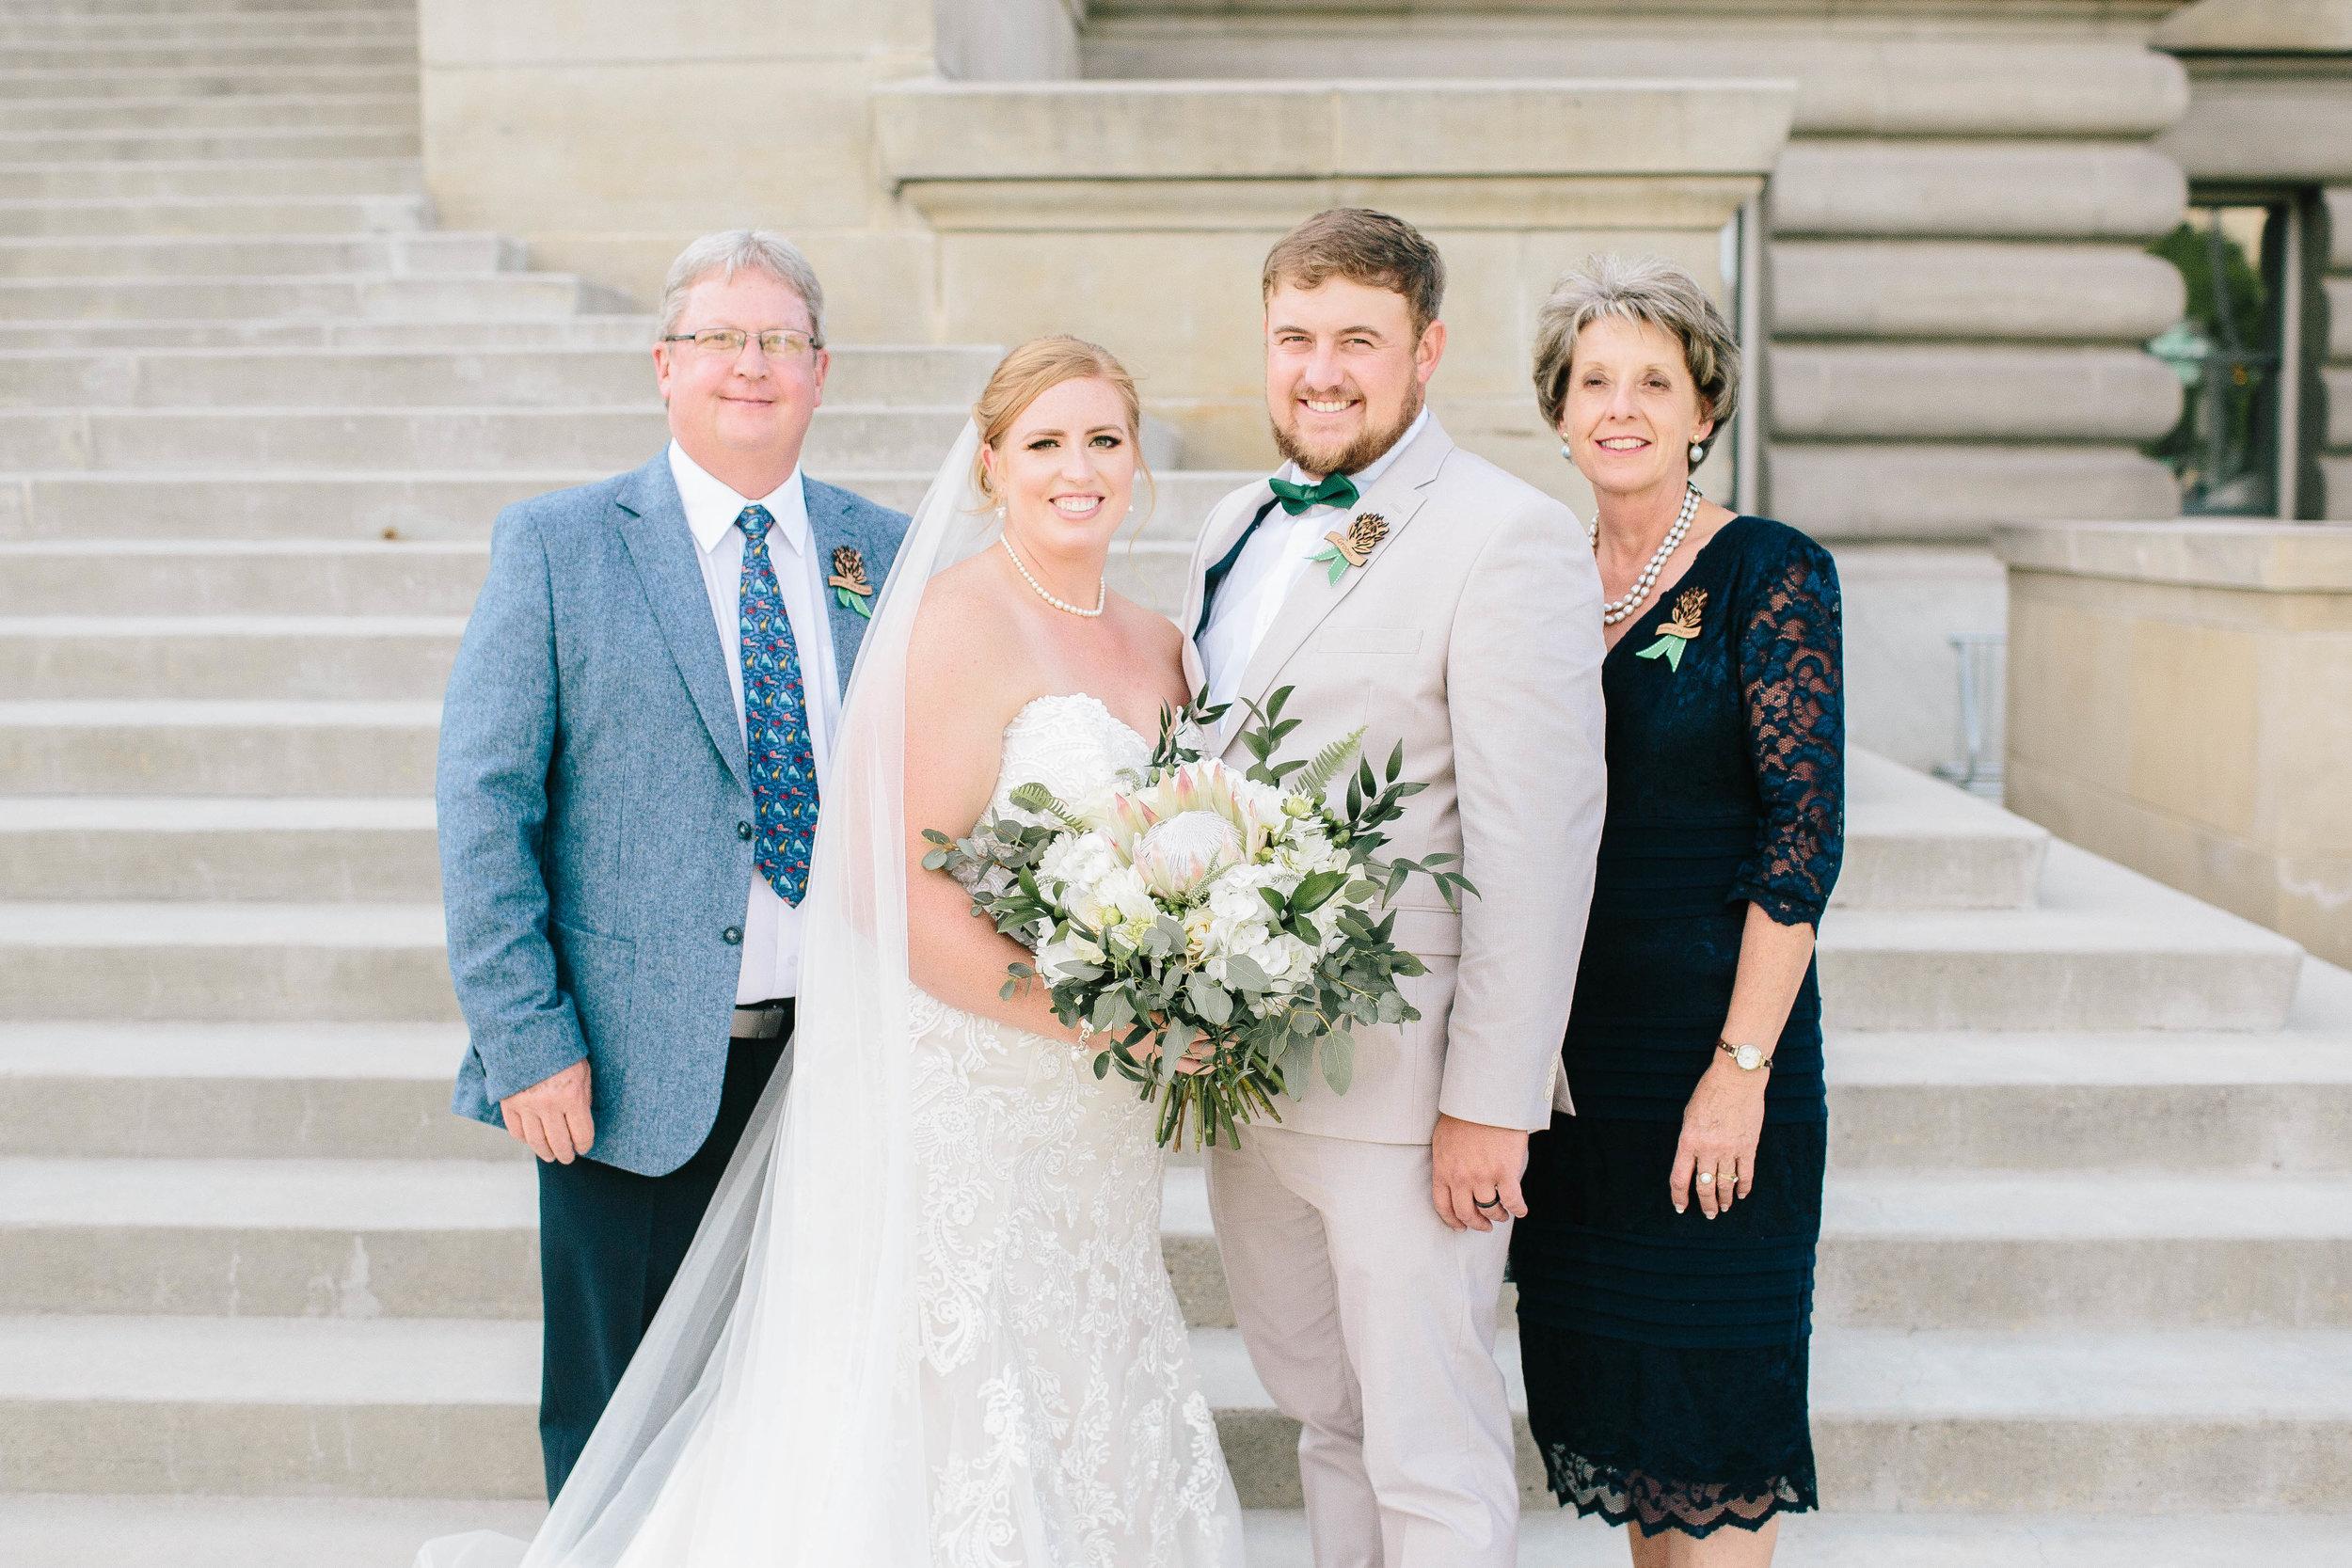 C-Lydia-Rohan-Downtown-Boise-Wedding-38.jpg